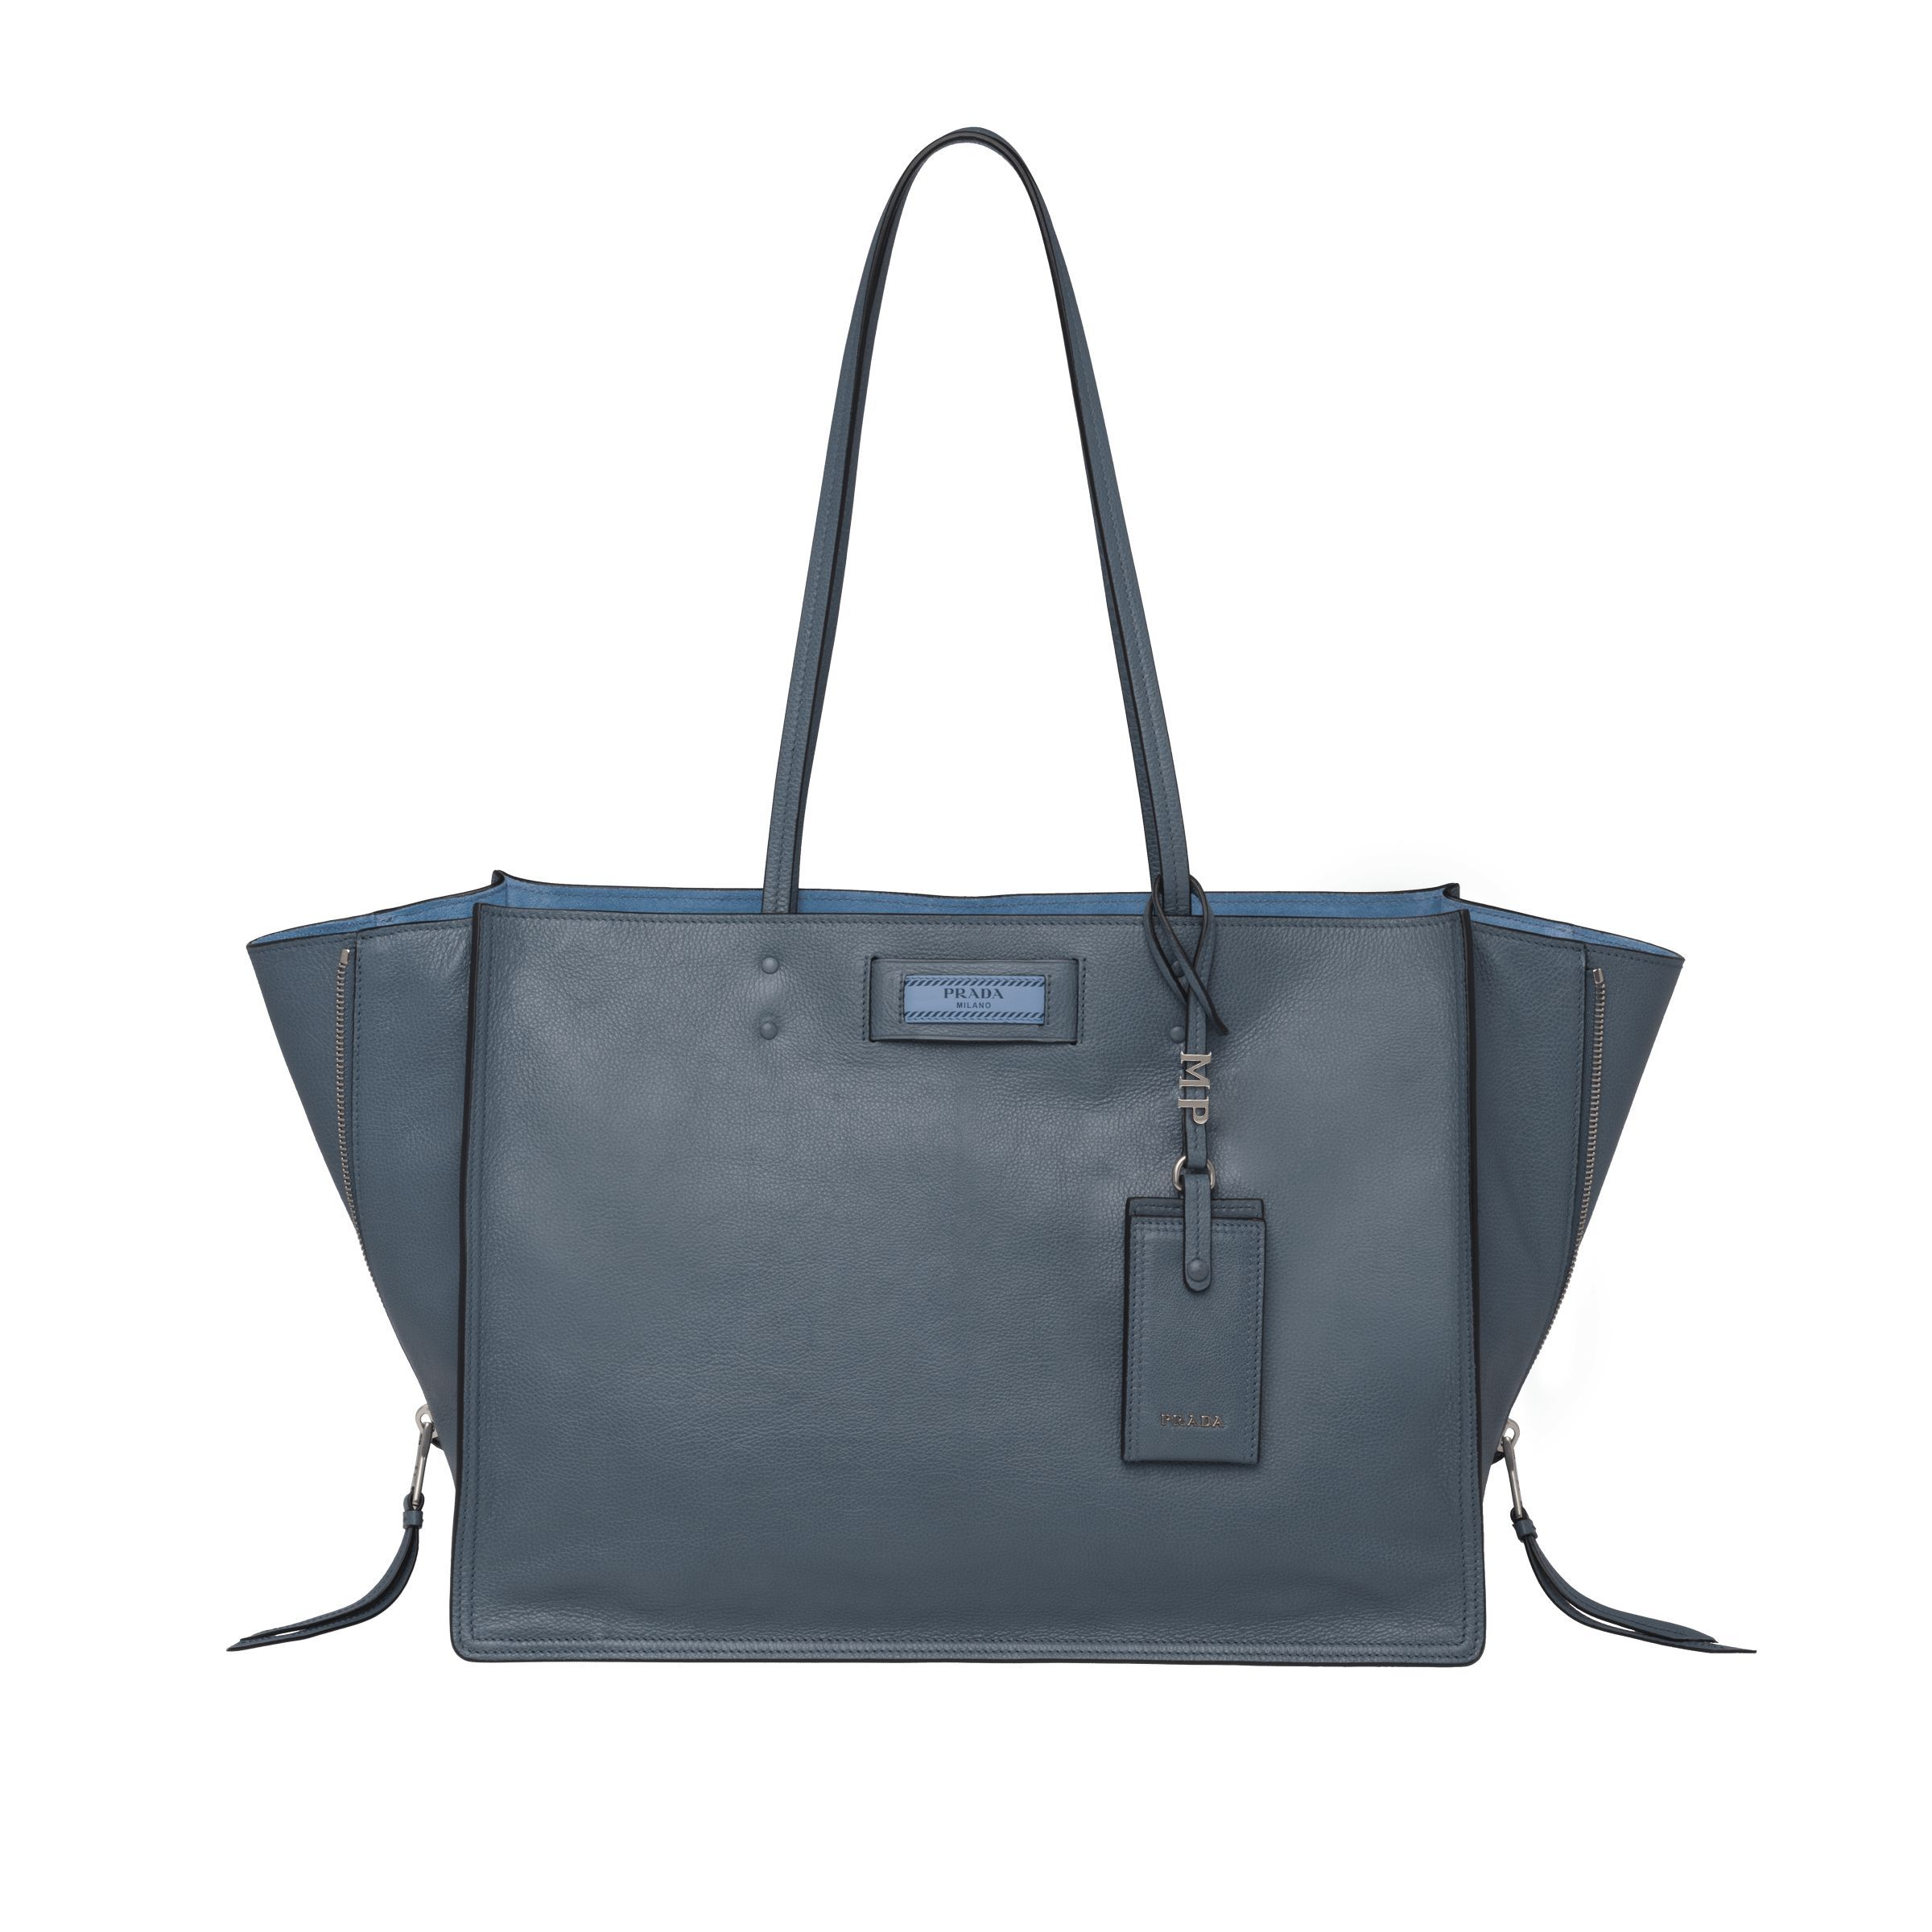 230872a35f Etiquette Bag in 2019 | Wish list | Bags, Prada bag, Prada